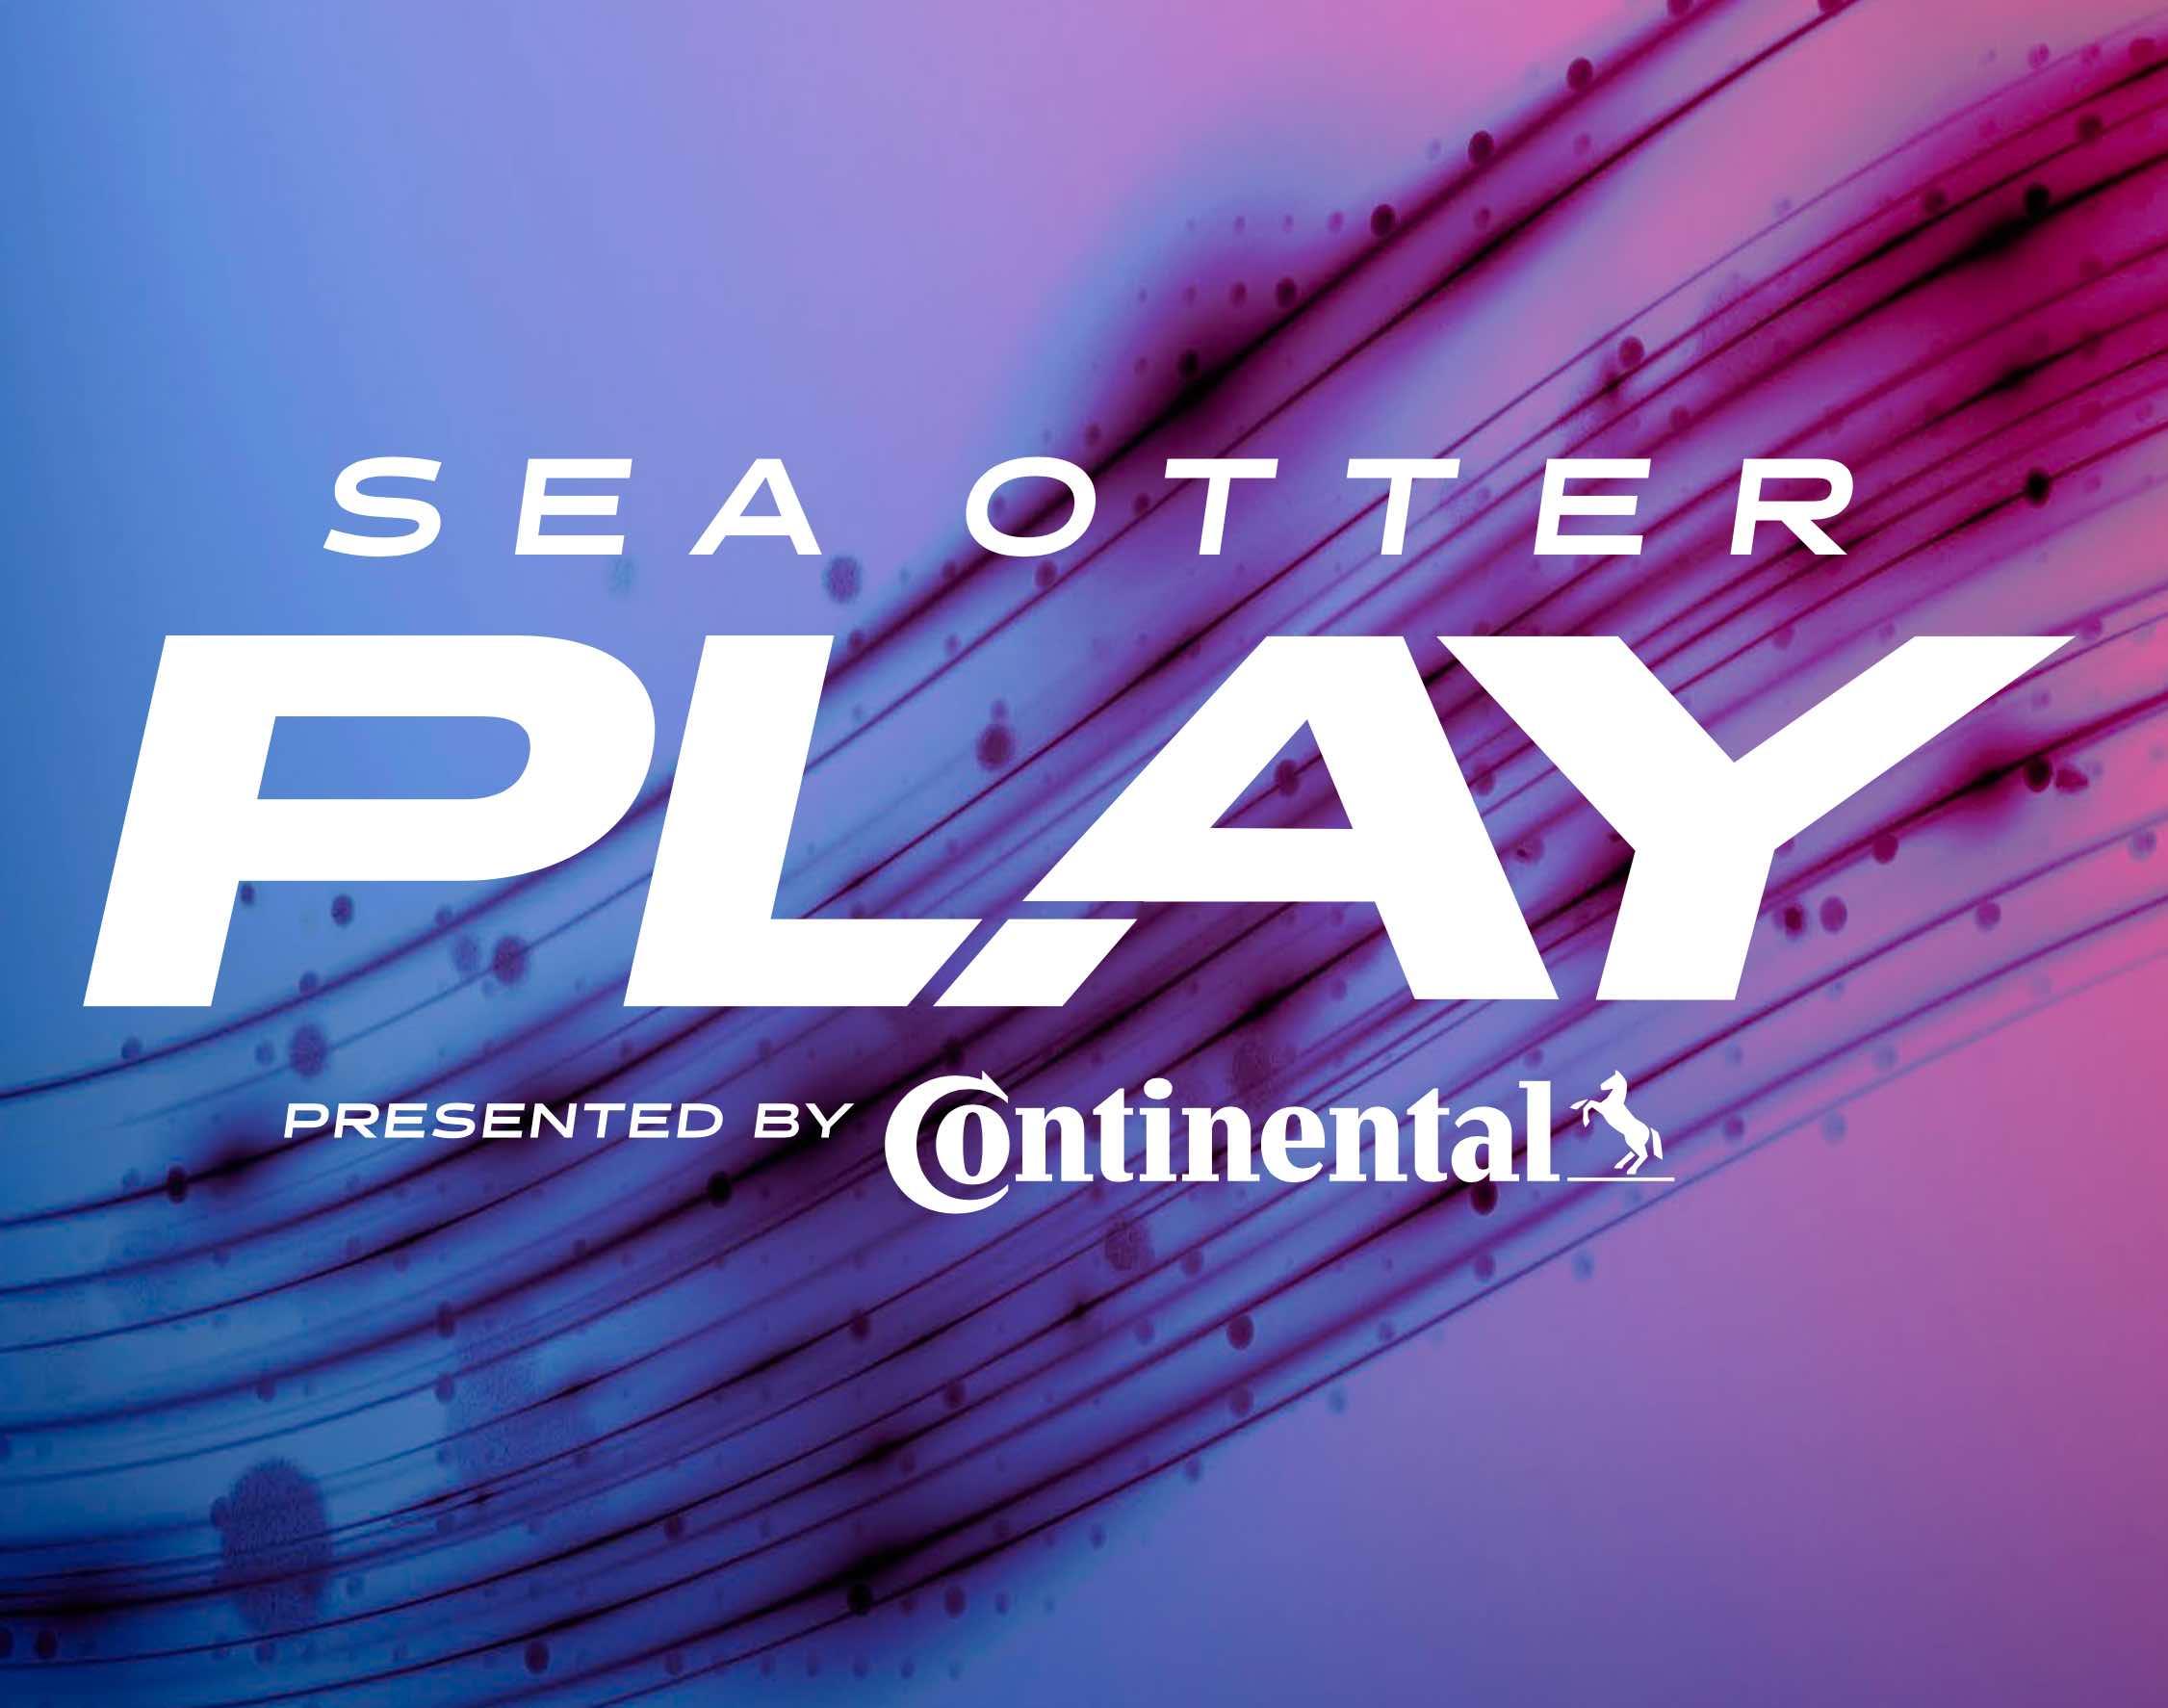 Sea Otter Europe virtual JoanSeguidor